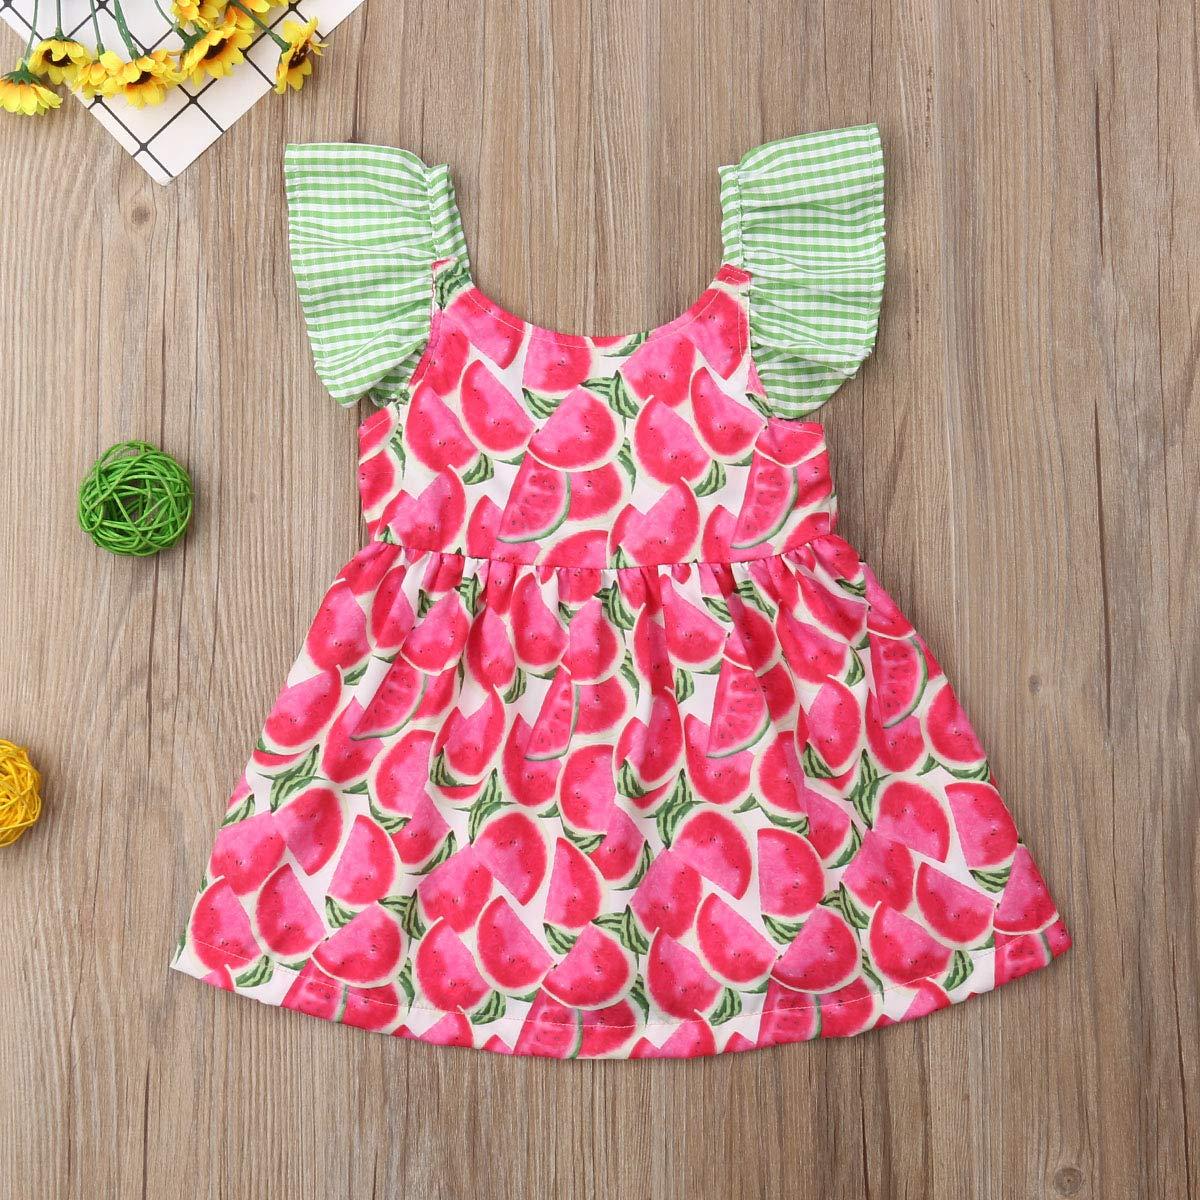 Dinlong Toddler Baby Kid Girls Summer Dresses Sleeveless Tie Stripe Condole Belt Casual Princess Skirt